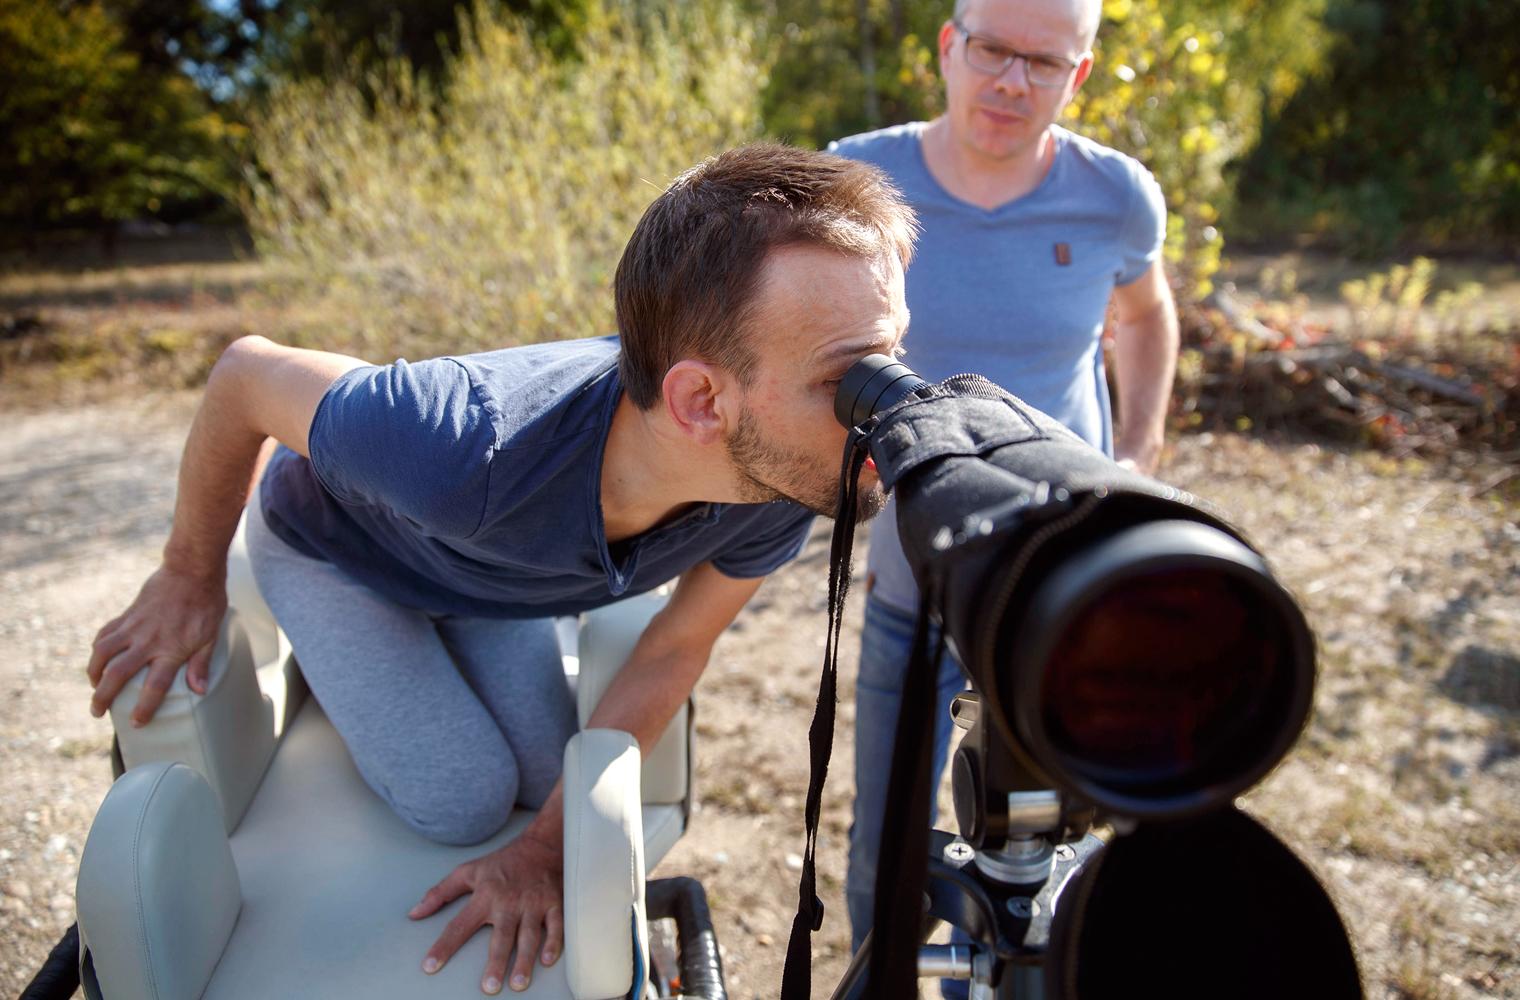 Freunde beim Birdwatching, Foto: Gottfried Stoppel